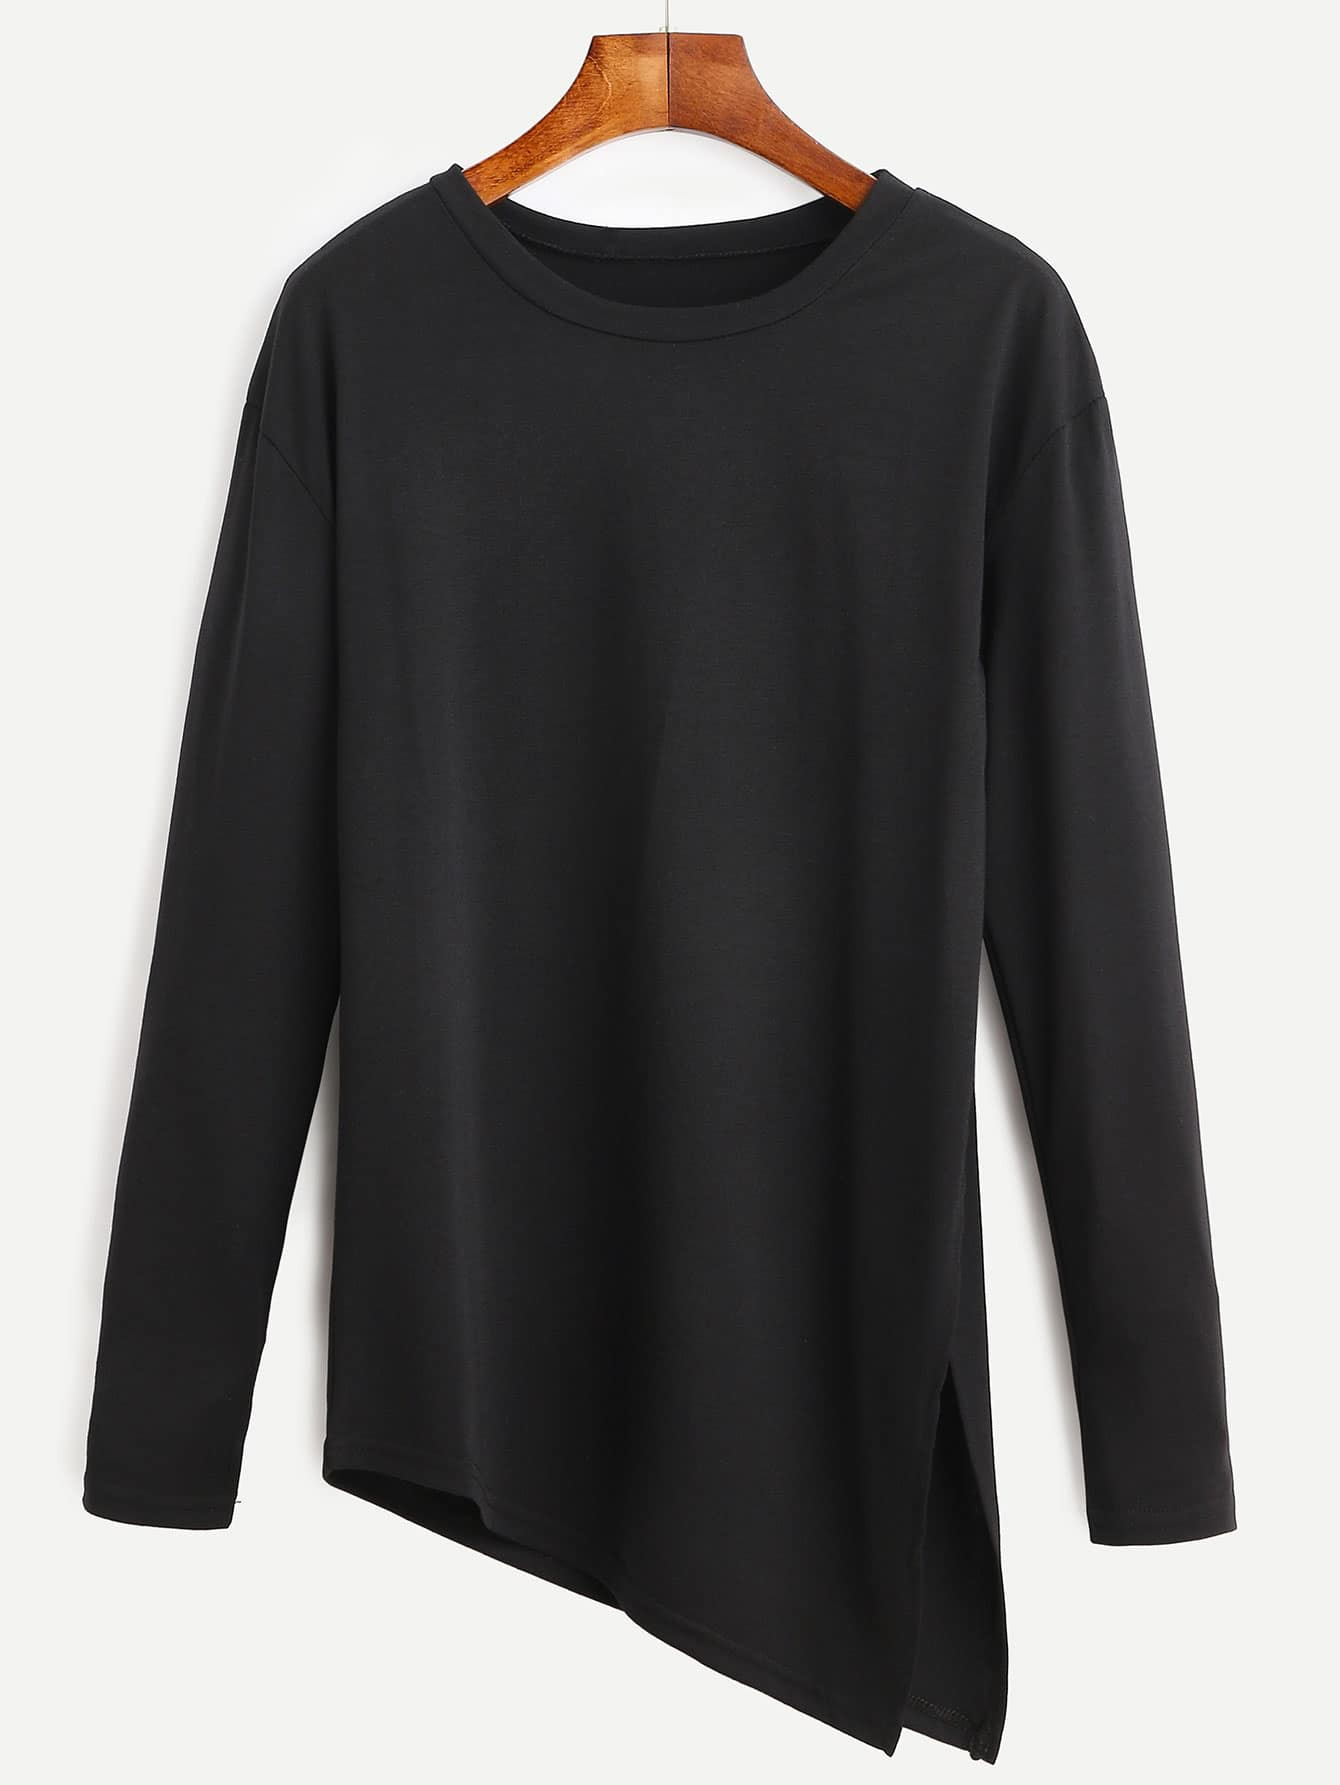 Black Asymmetrical Slit Side Long Sleeve T-shirt RTSH160812101